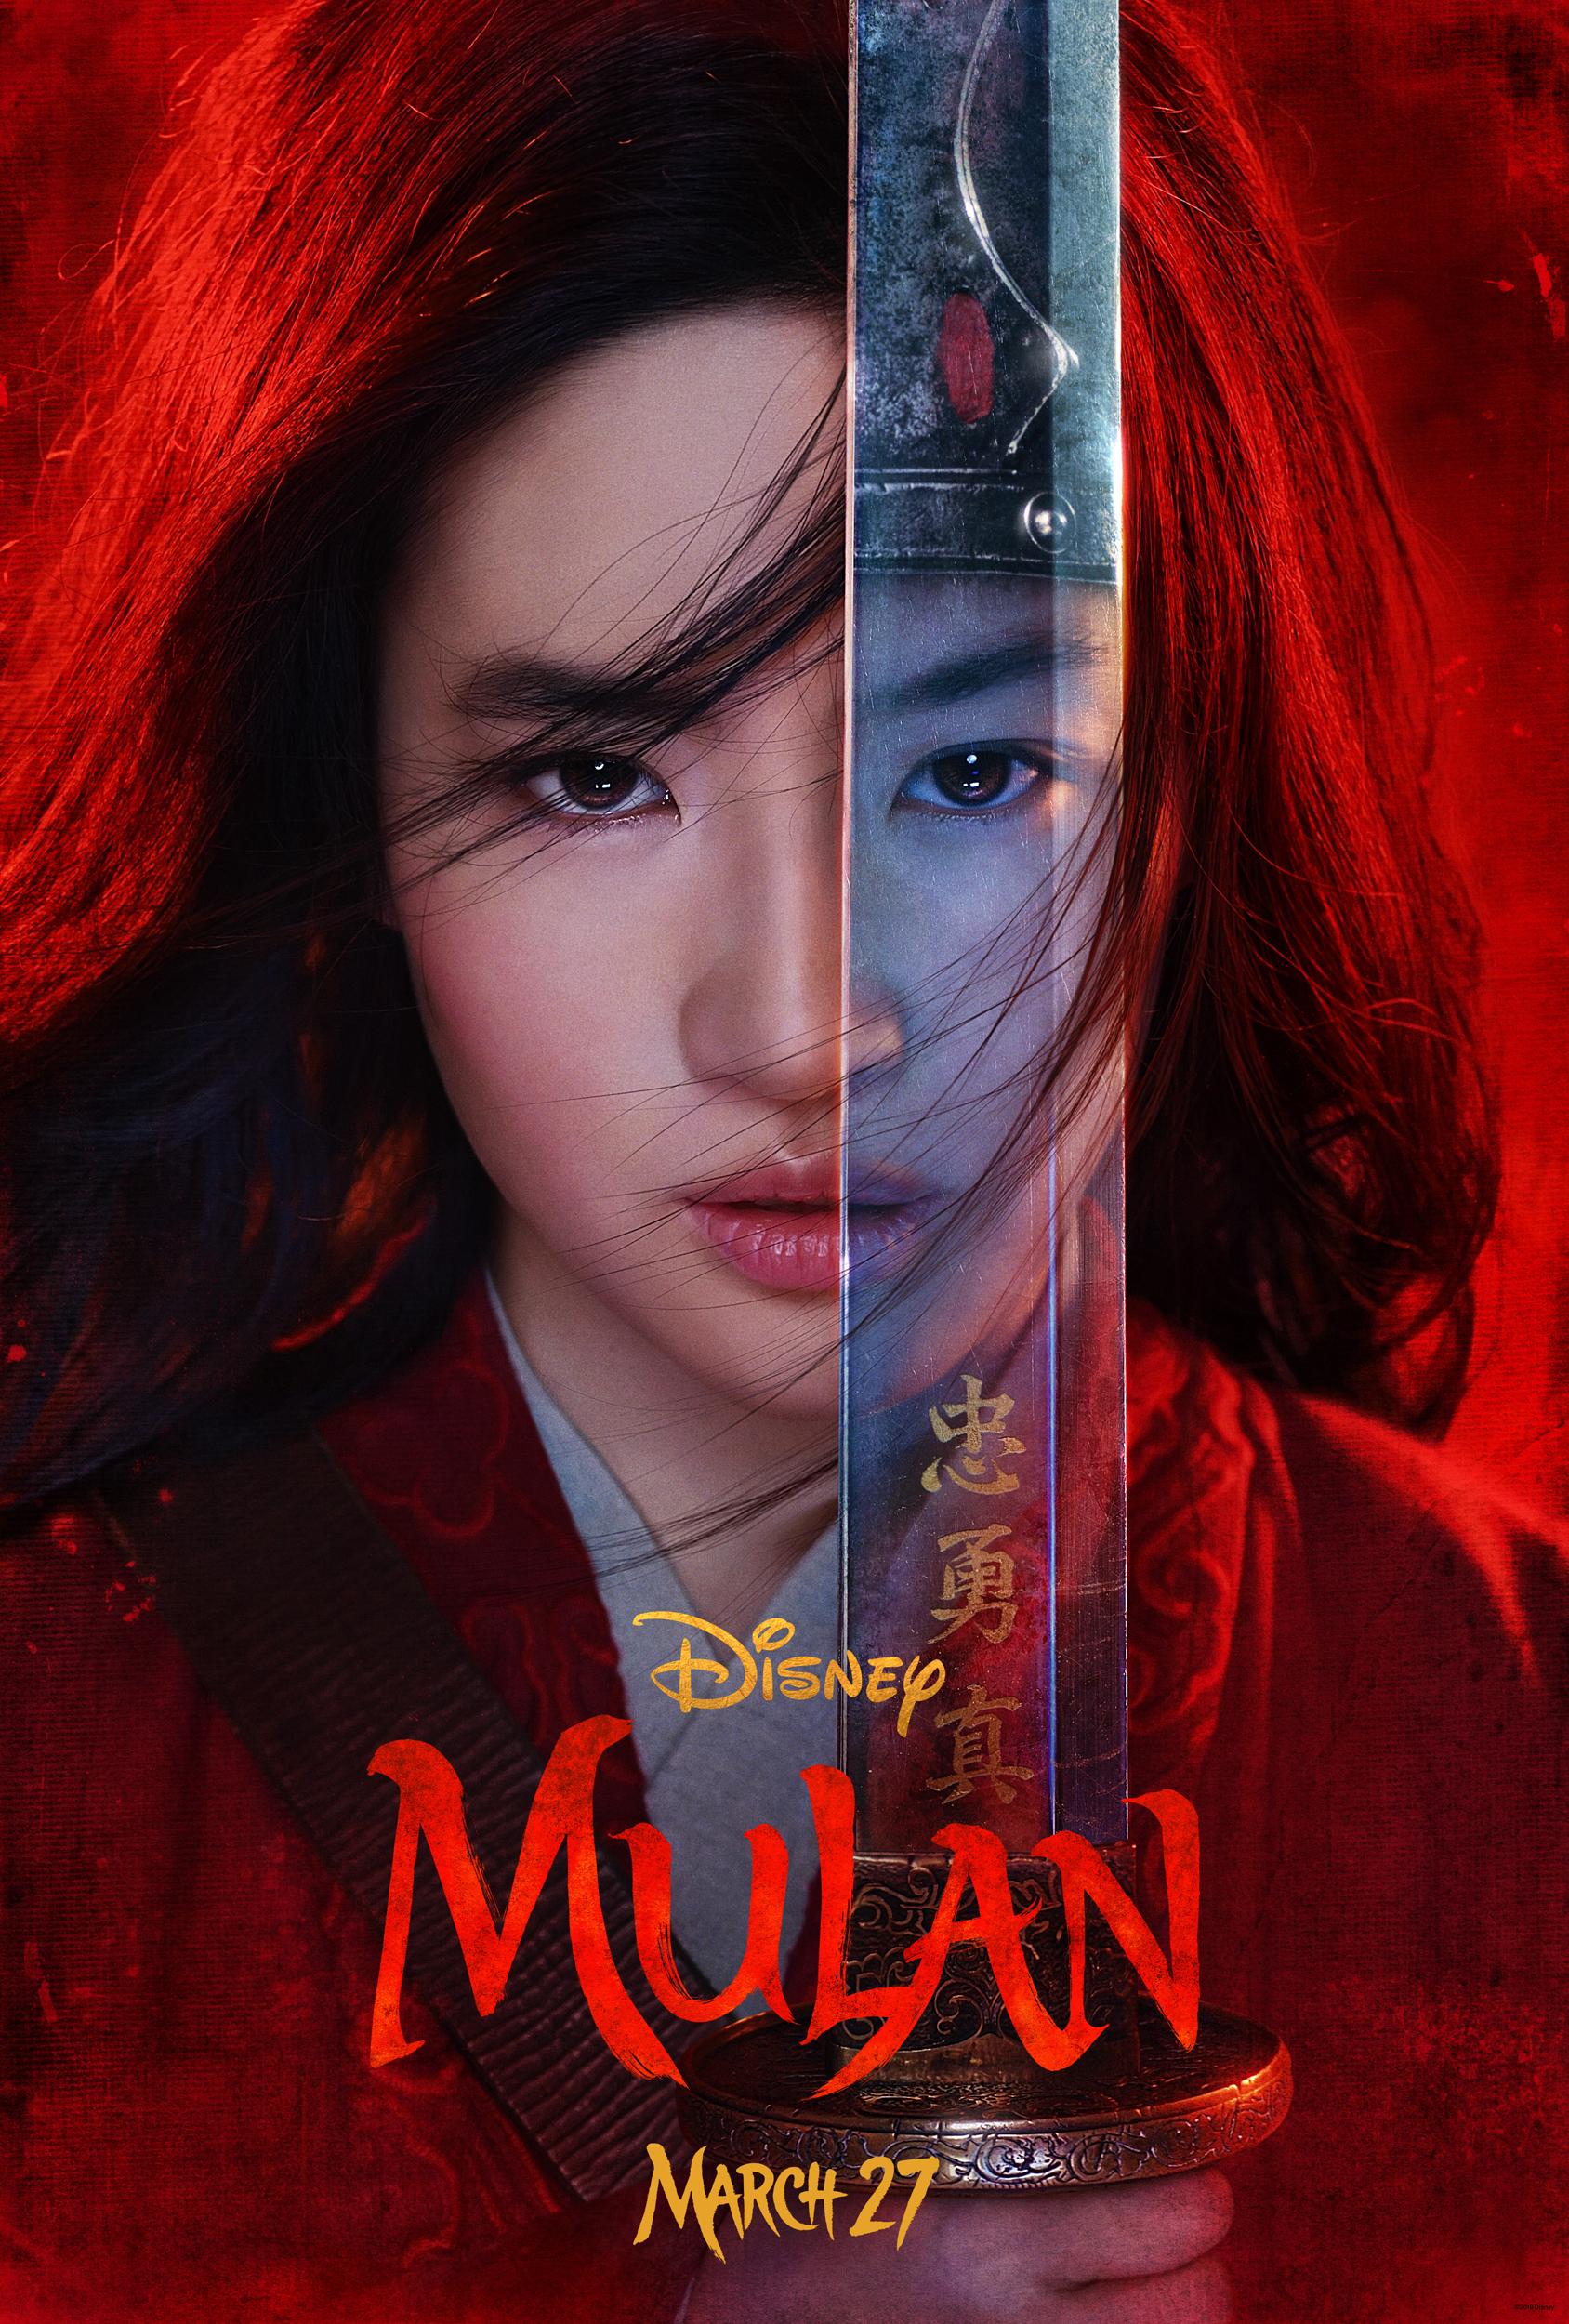 First Look: Disney's Mulan